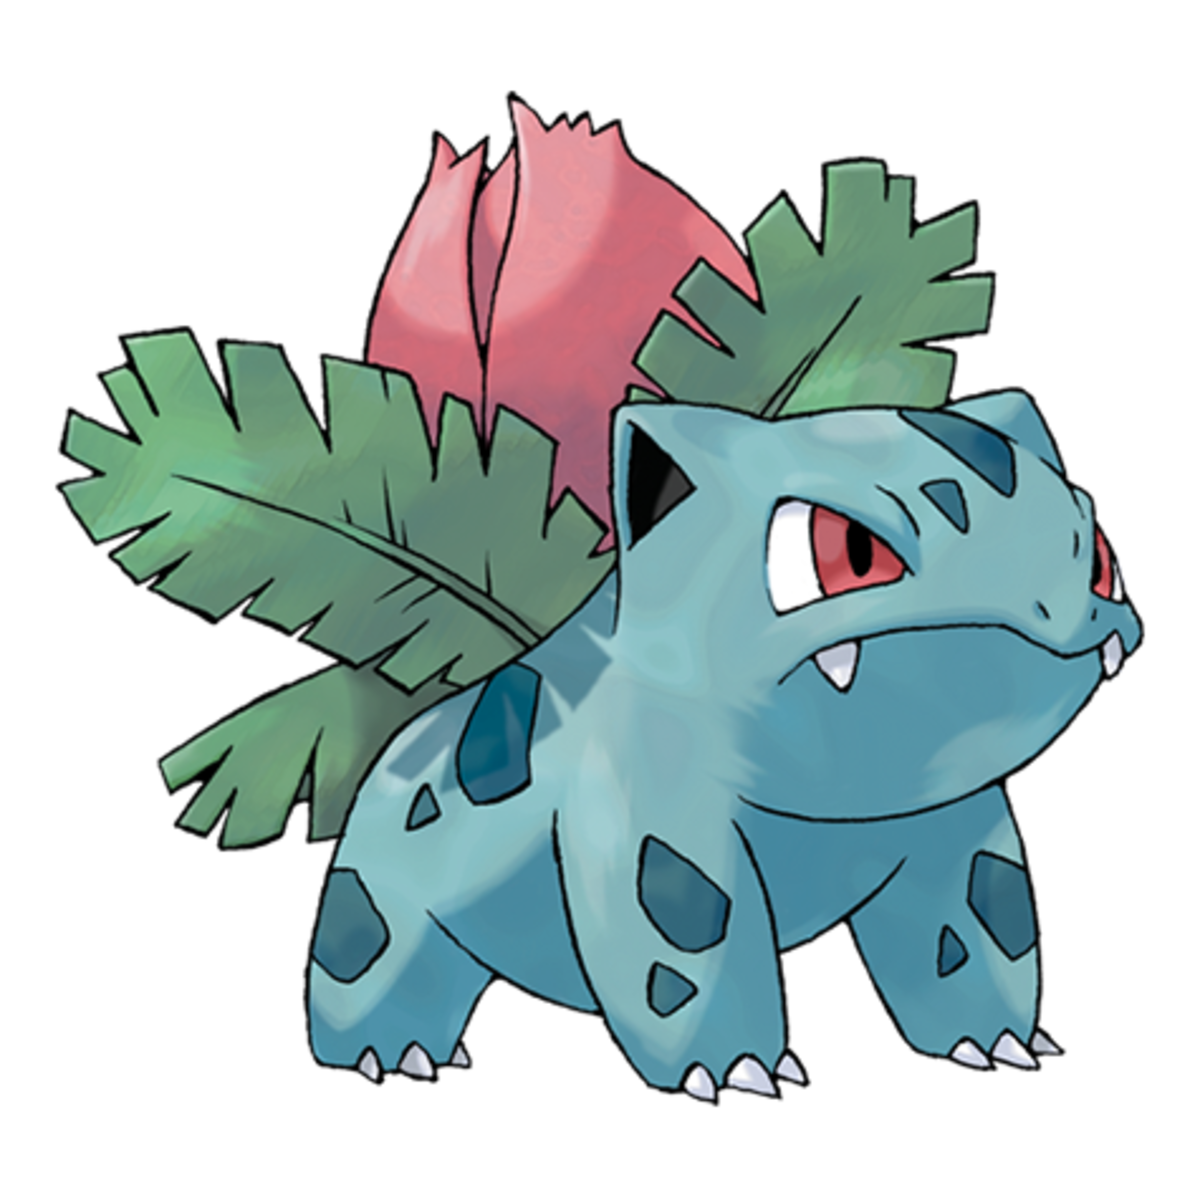 Nicknames for Ivysaur